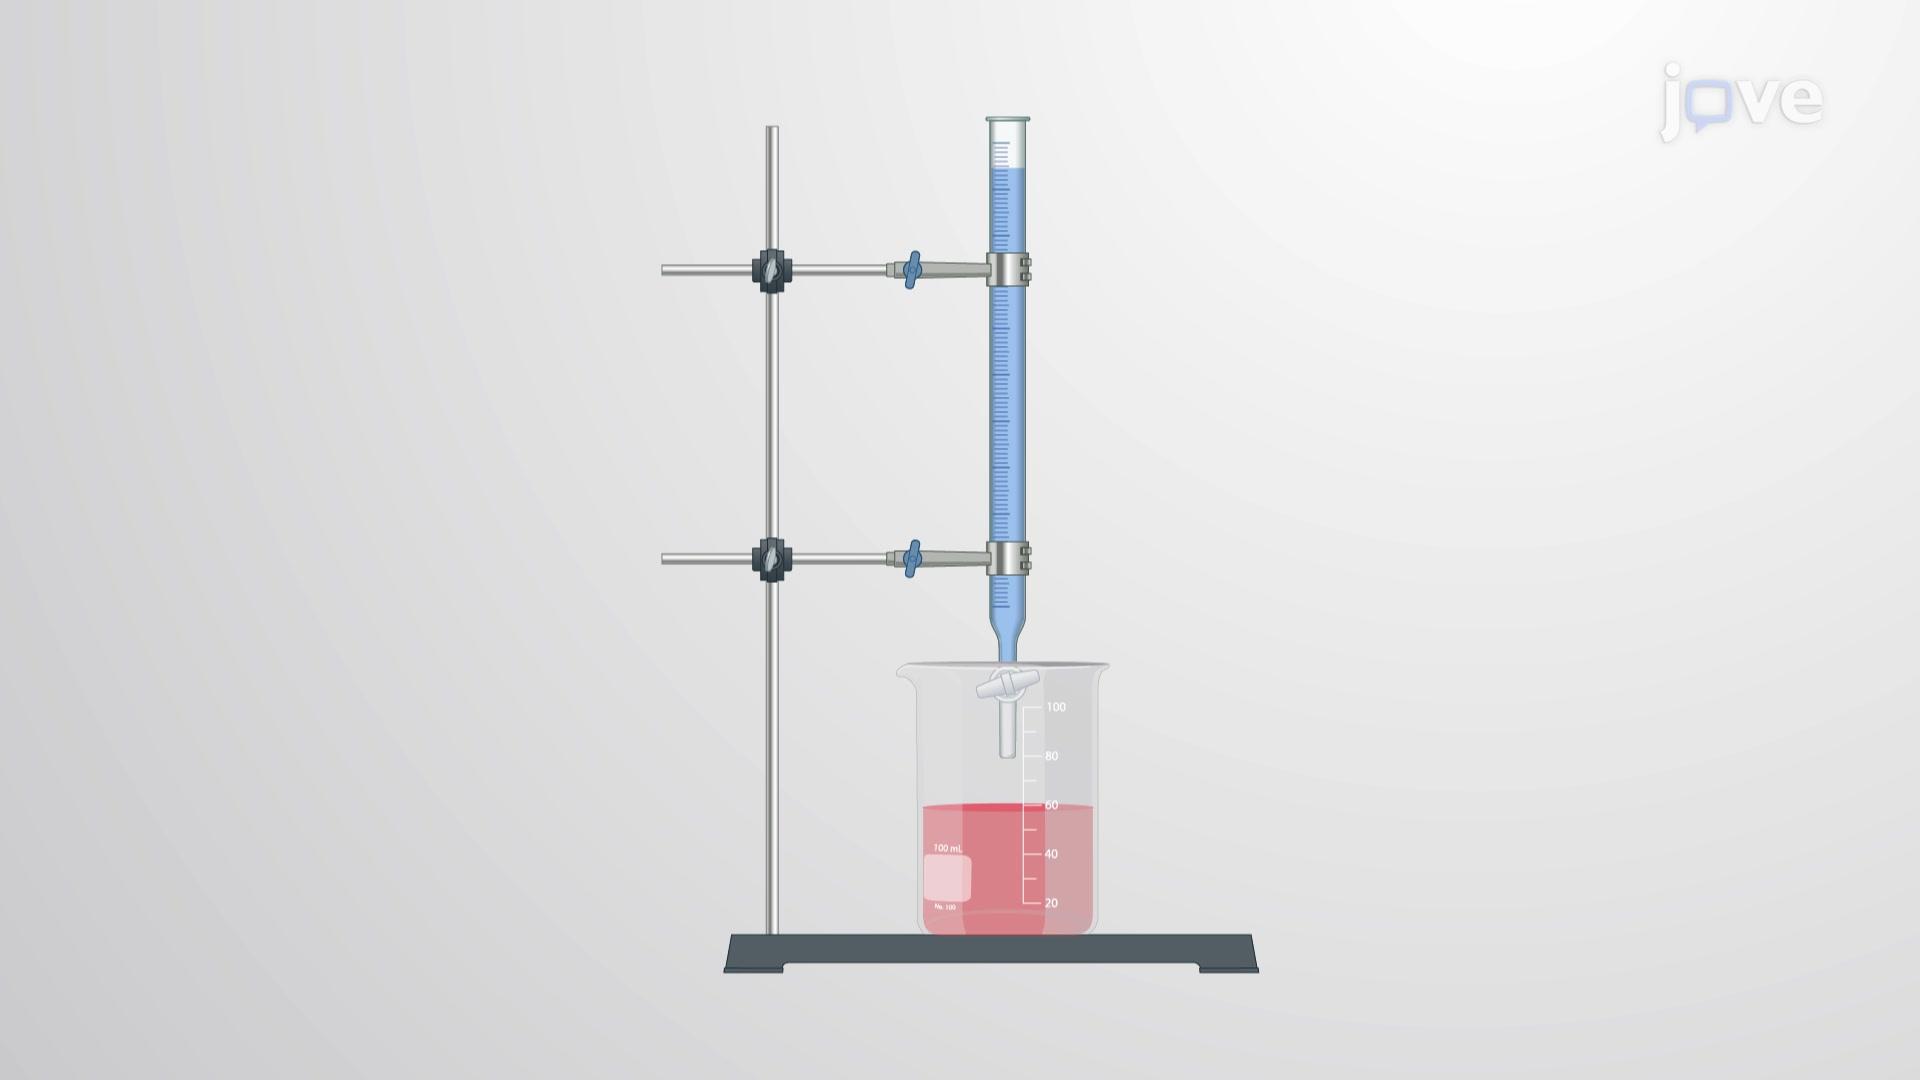 Acid-Base Titration Curves